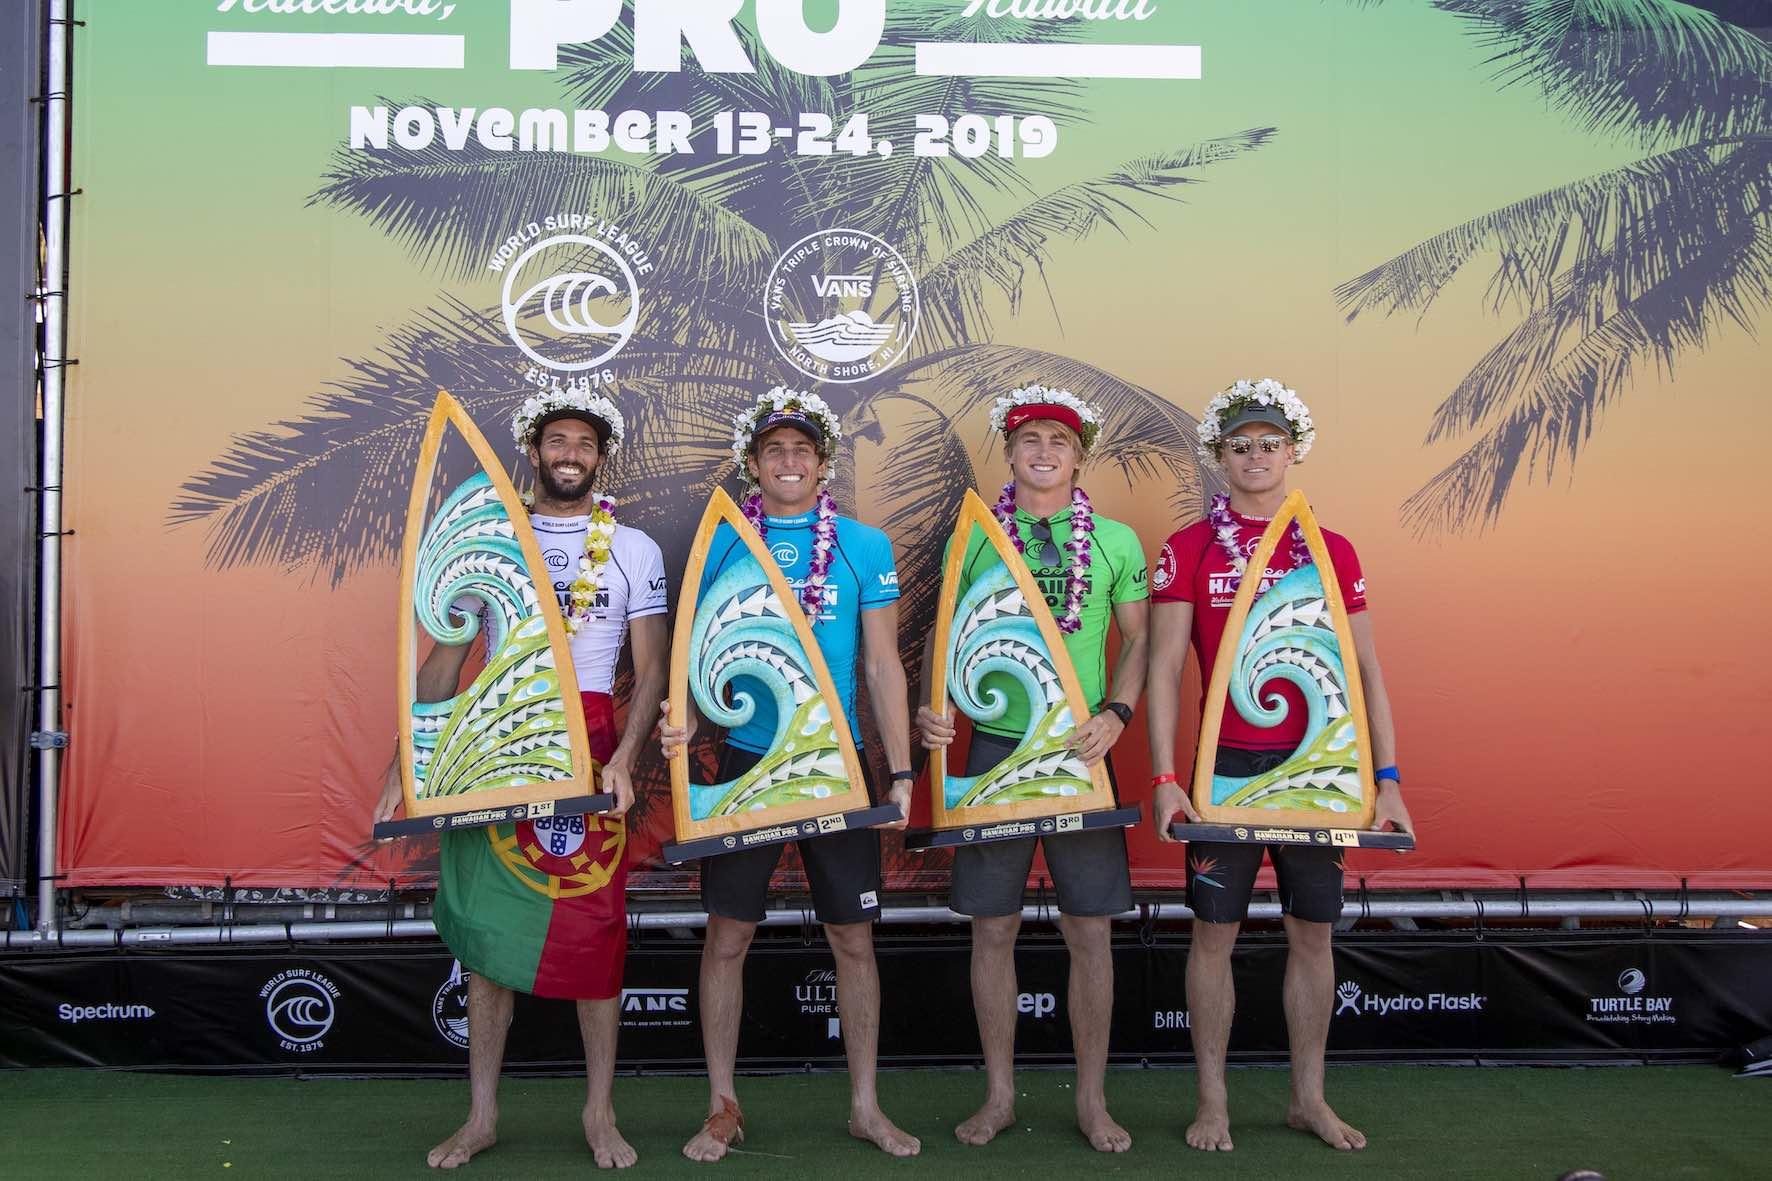 Matt McGillivray surfing his way to 3rd at the 2019 Hawaiian Pro